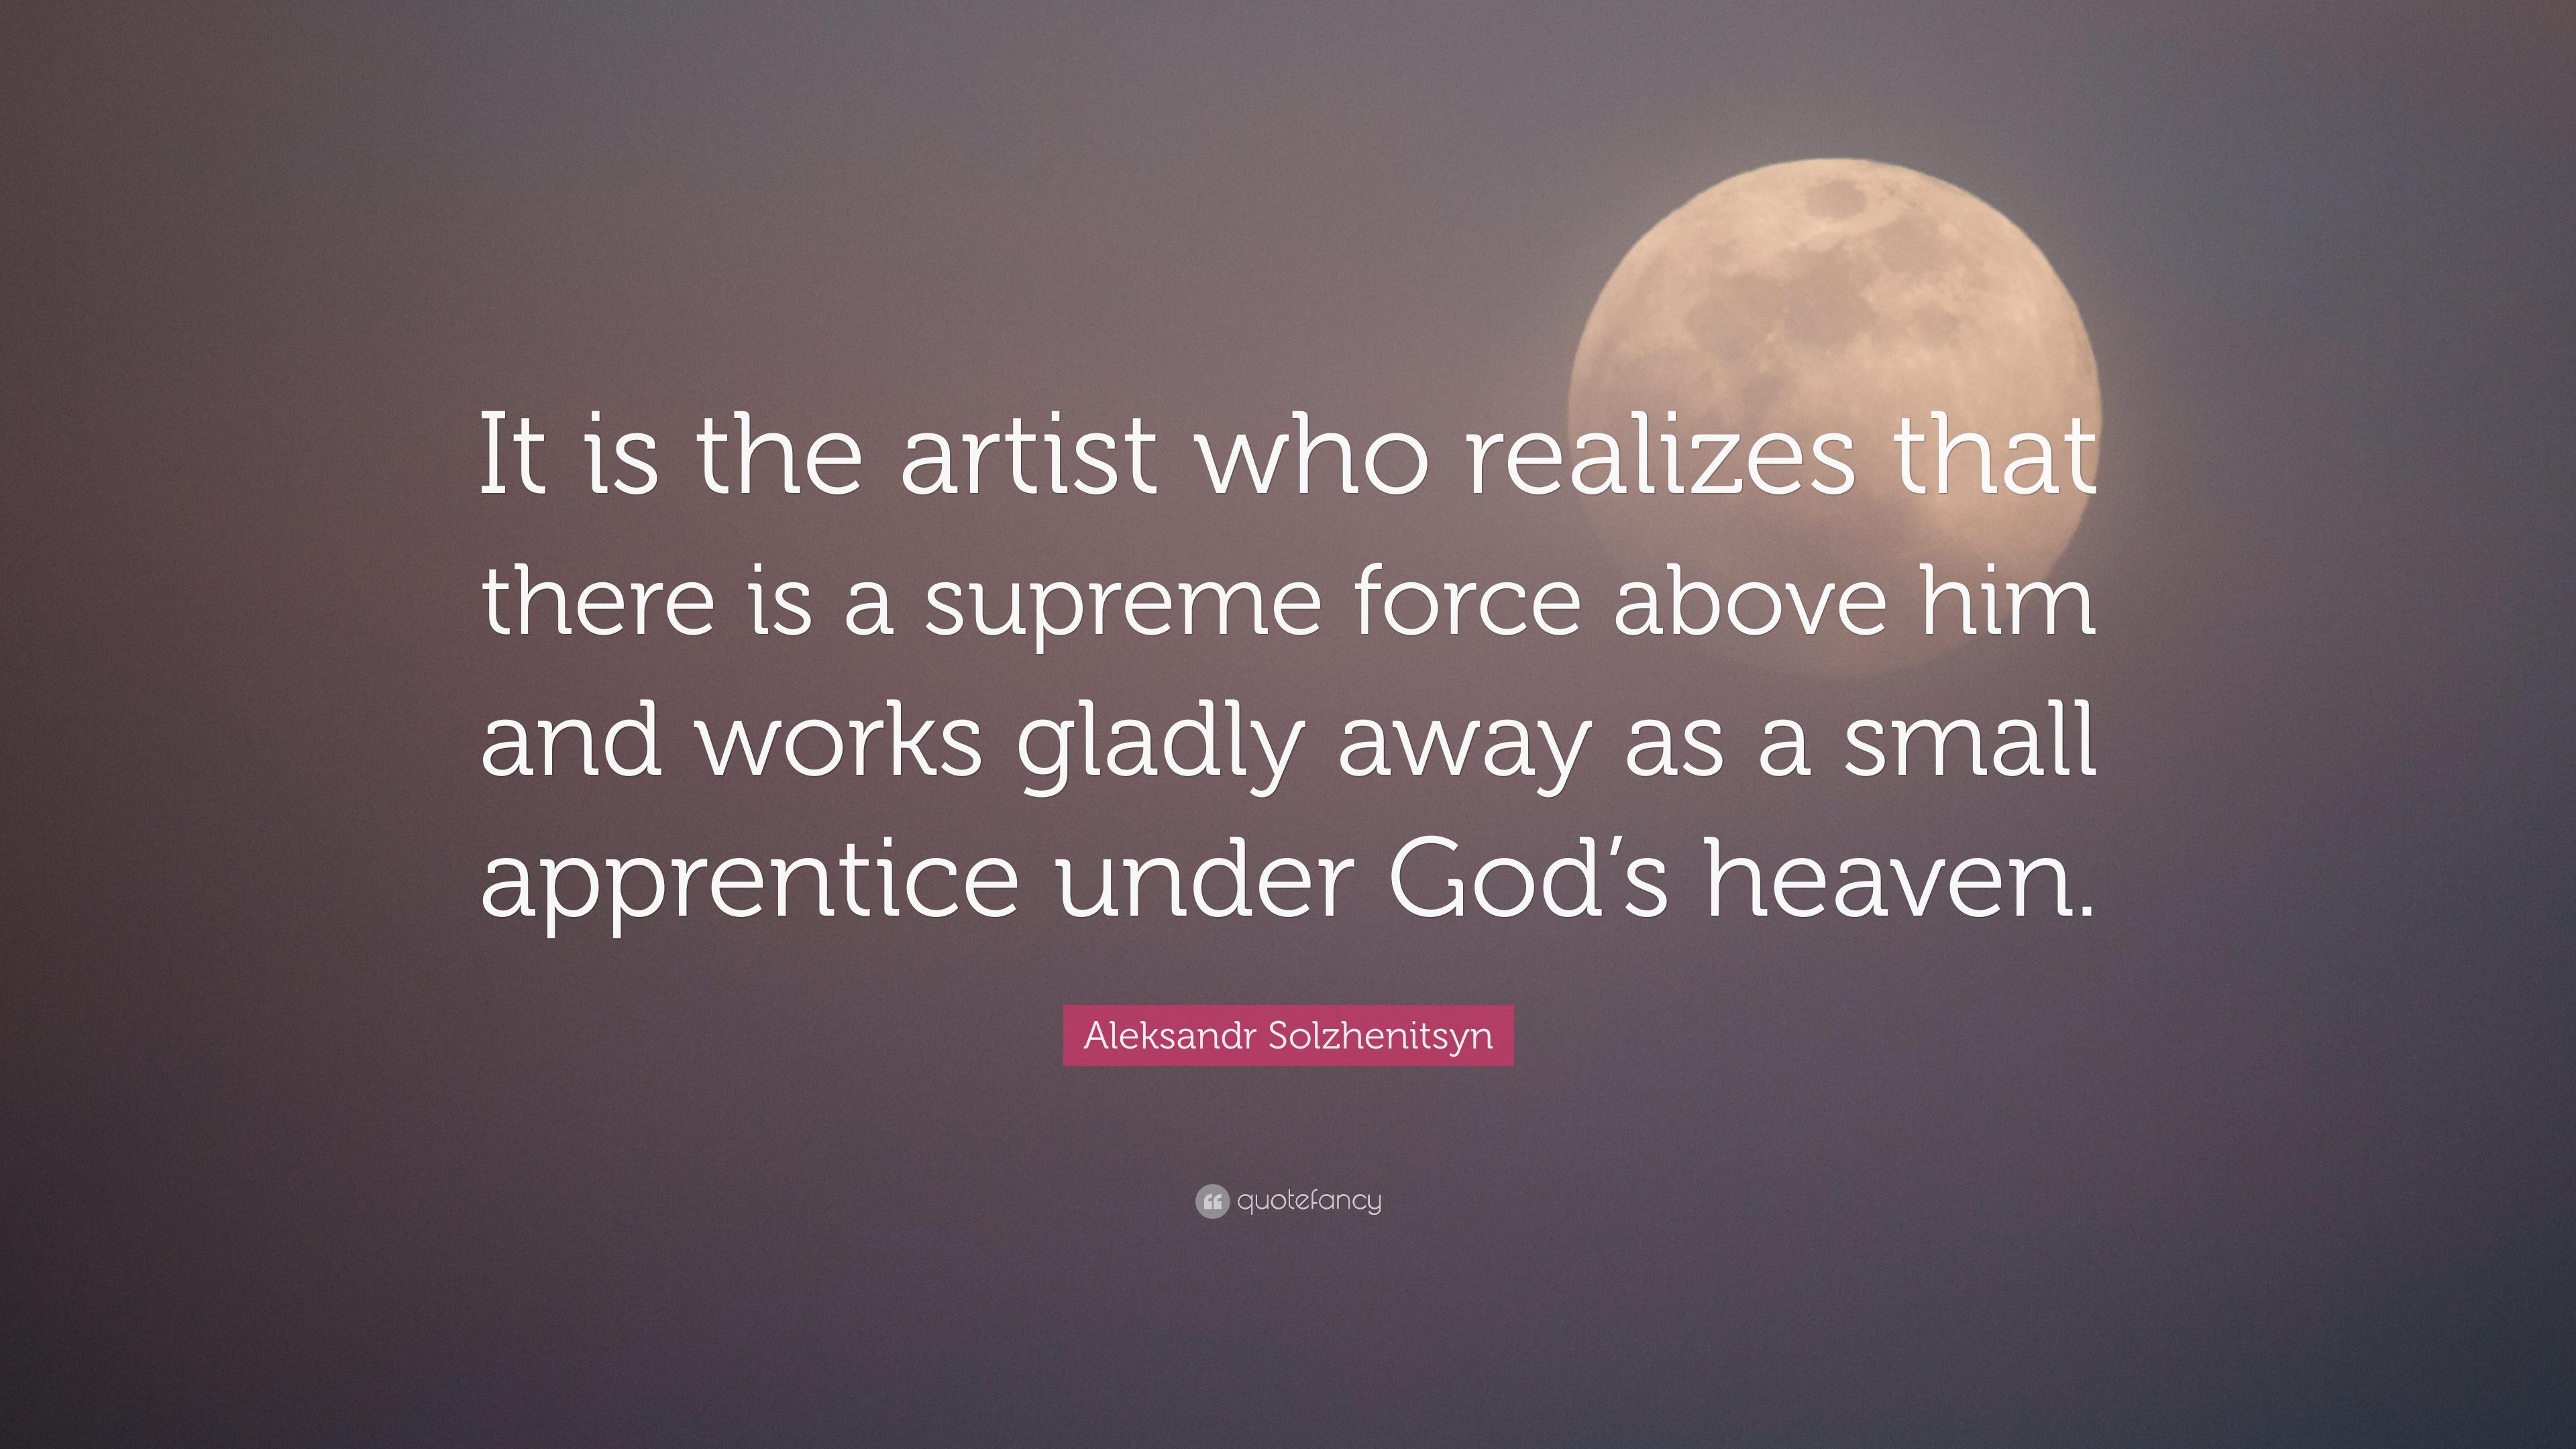 Aleksandr Solzhenitsyn Quote It Is The Artist Who Realizes